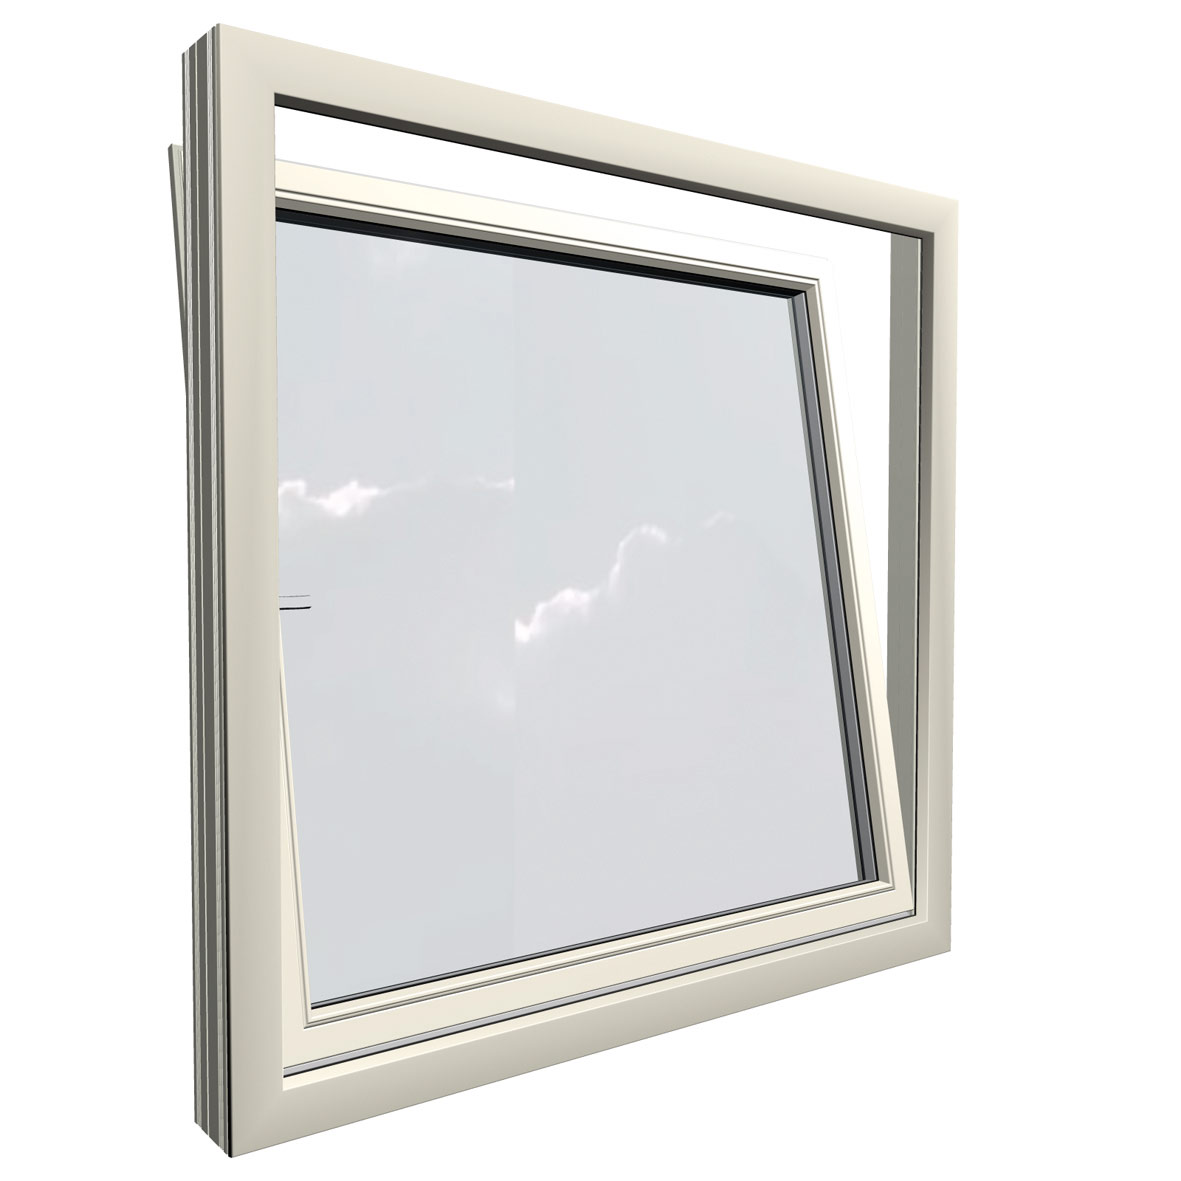 Commercial Tilt And Turn Windows : Contura idealcombi uk